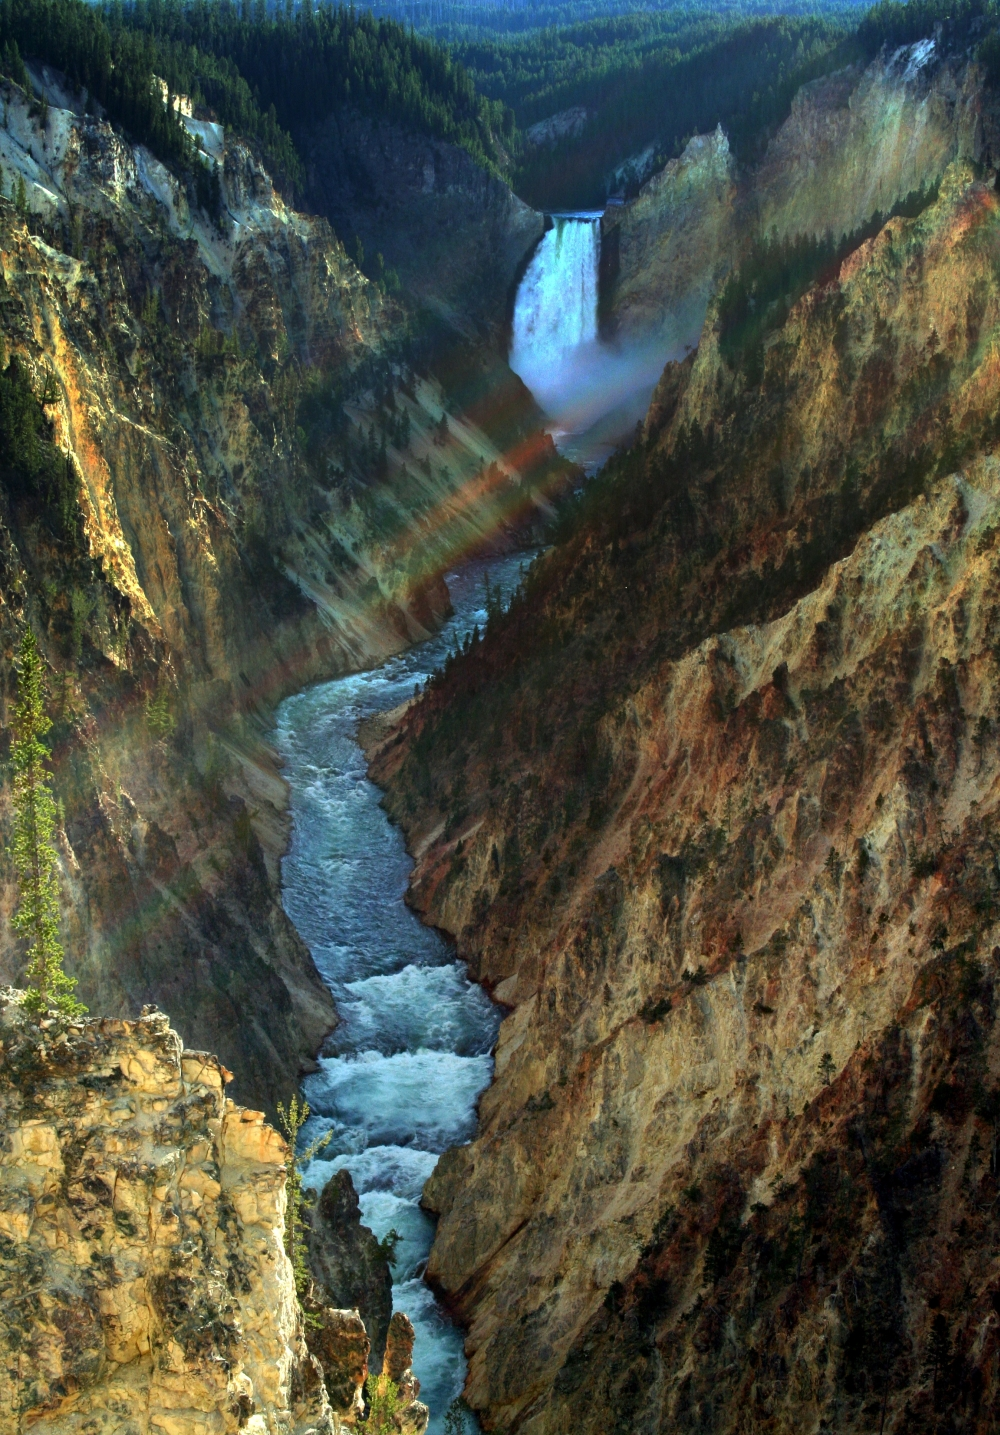 Нижний Водопад и каньон реки Йеллоустон. Фото: Adam Olson